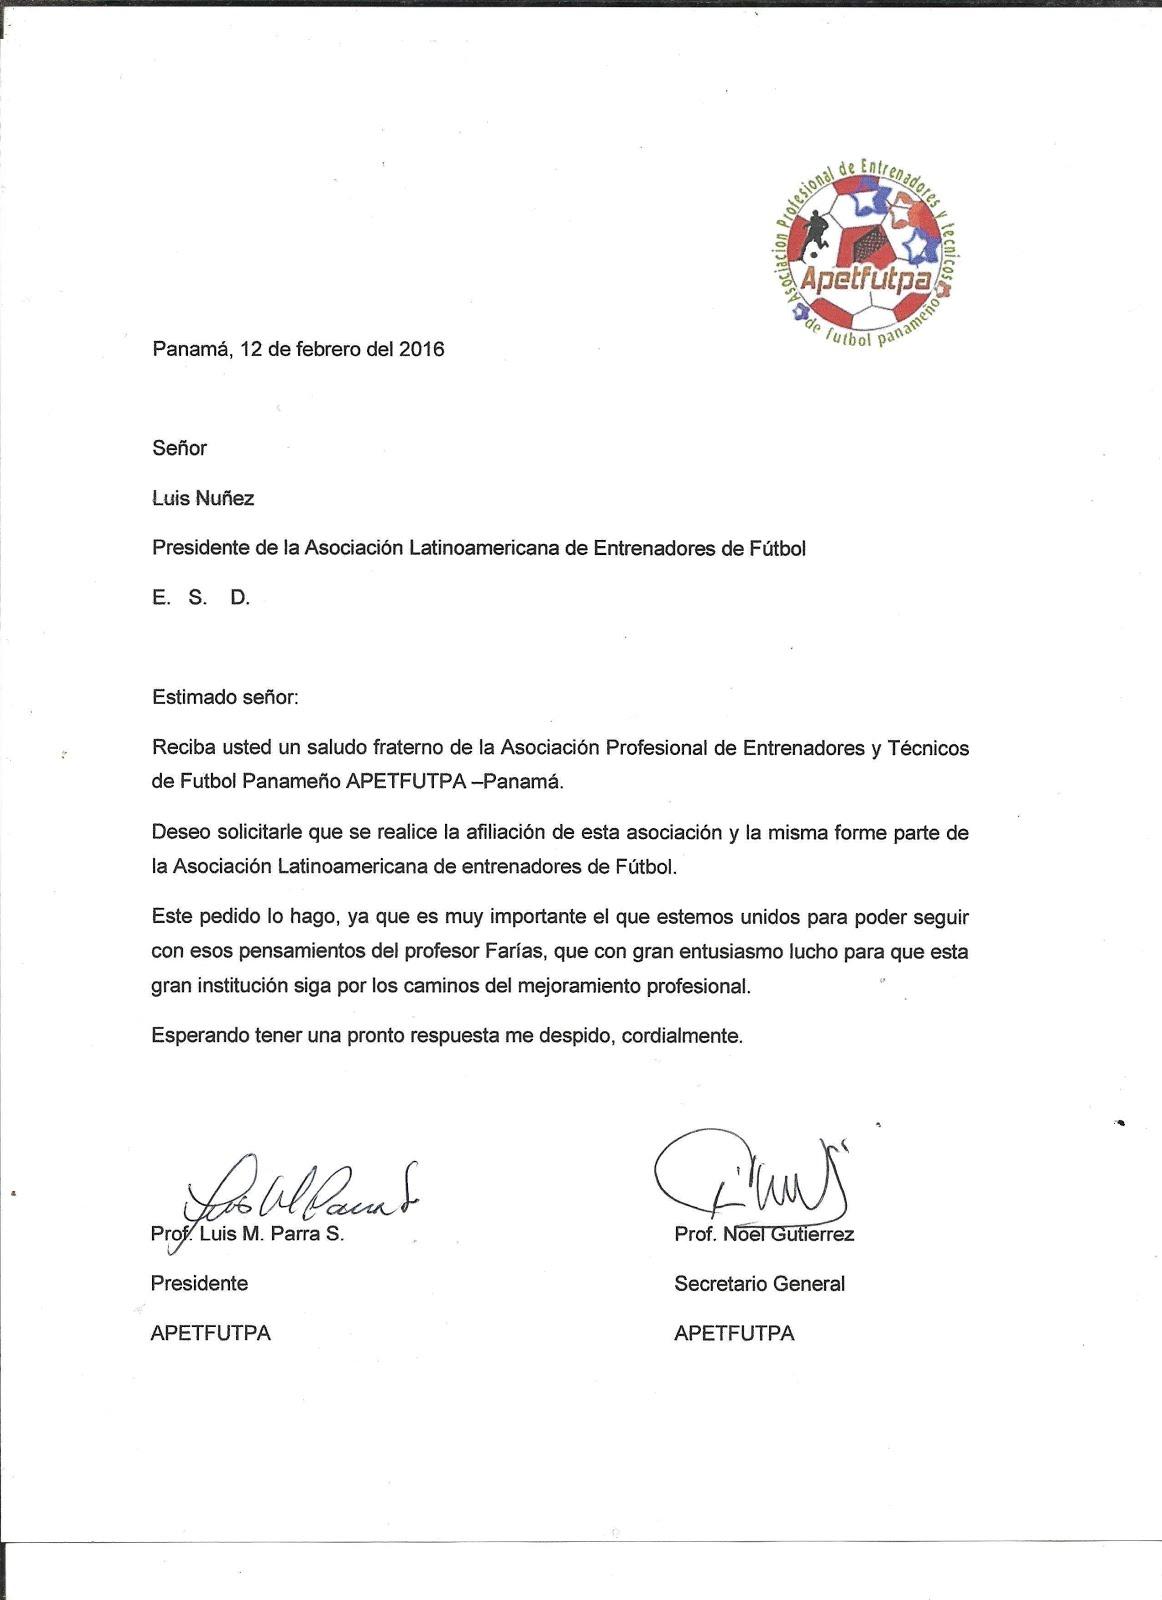 Asociación Latinoamericana de Entrenadores de Fútbol: julio 2016